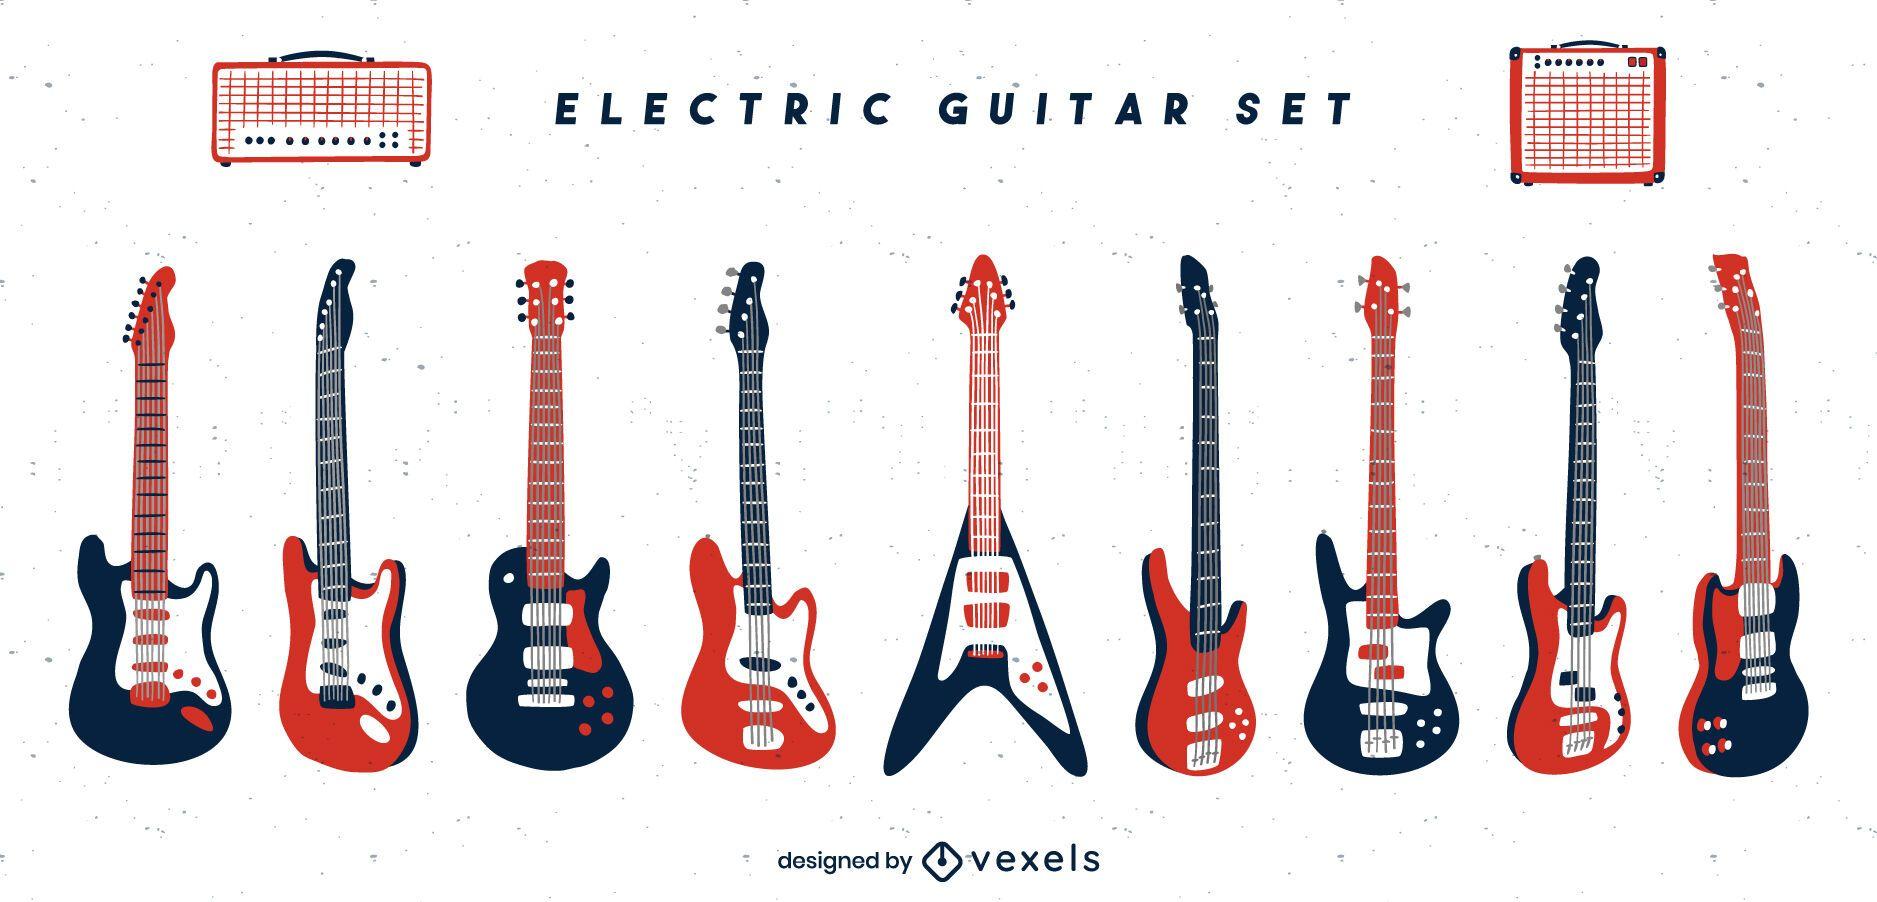 Electric guitar instrument set